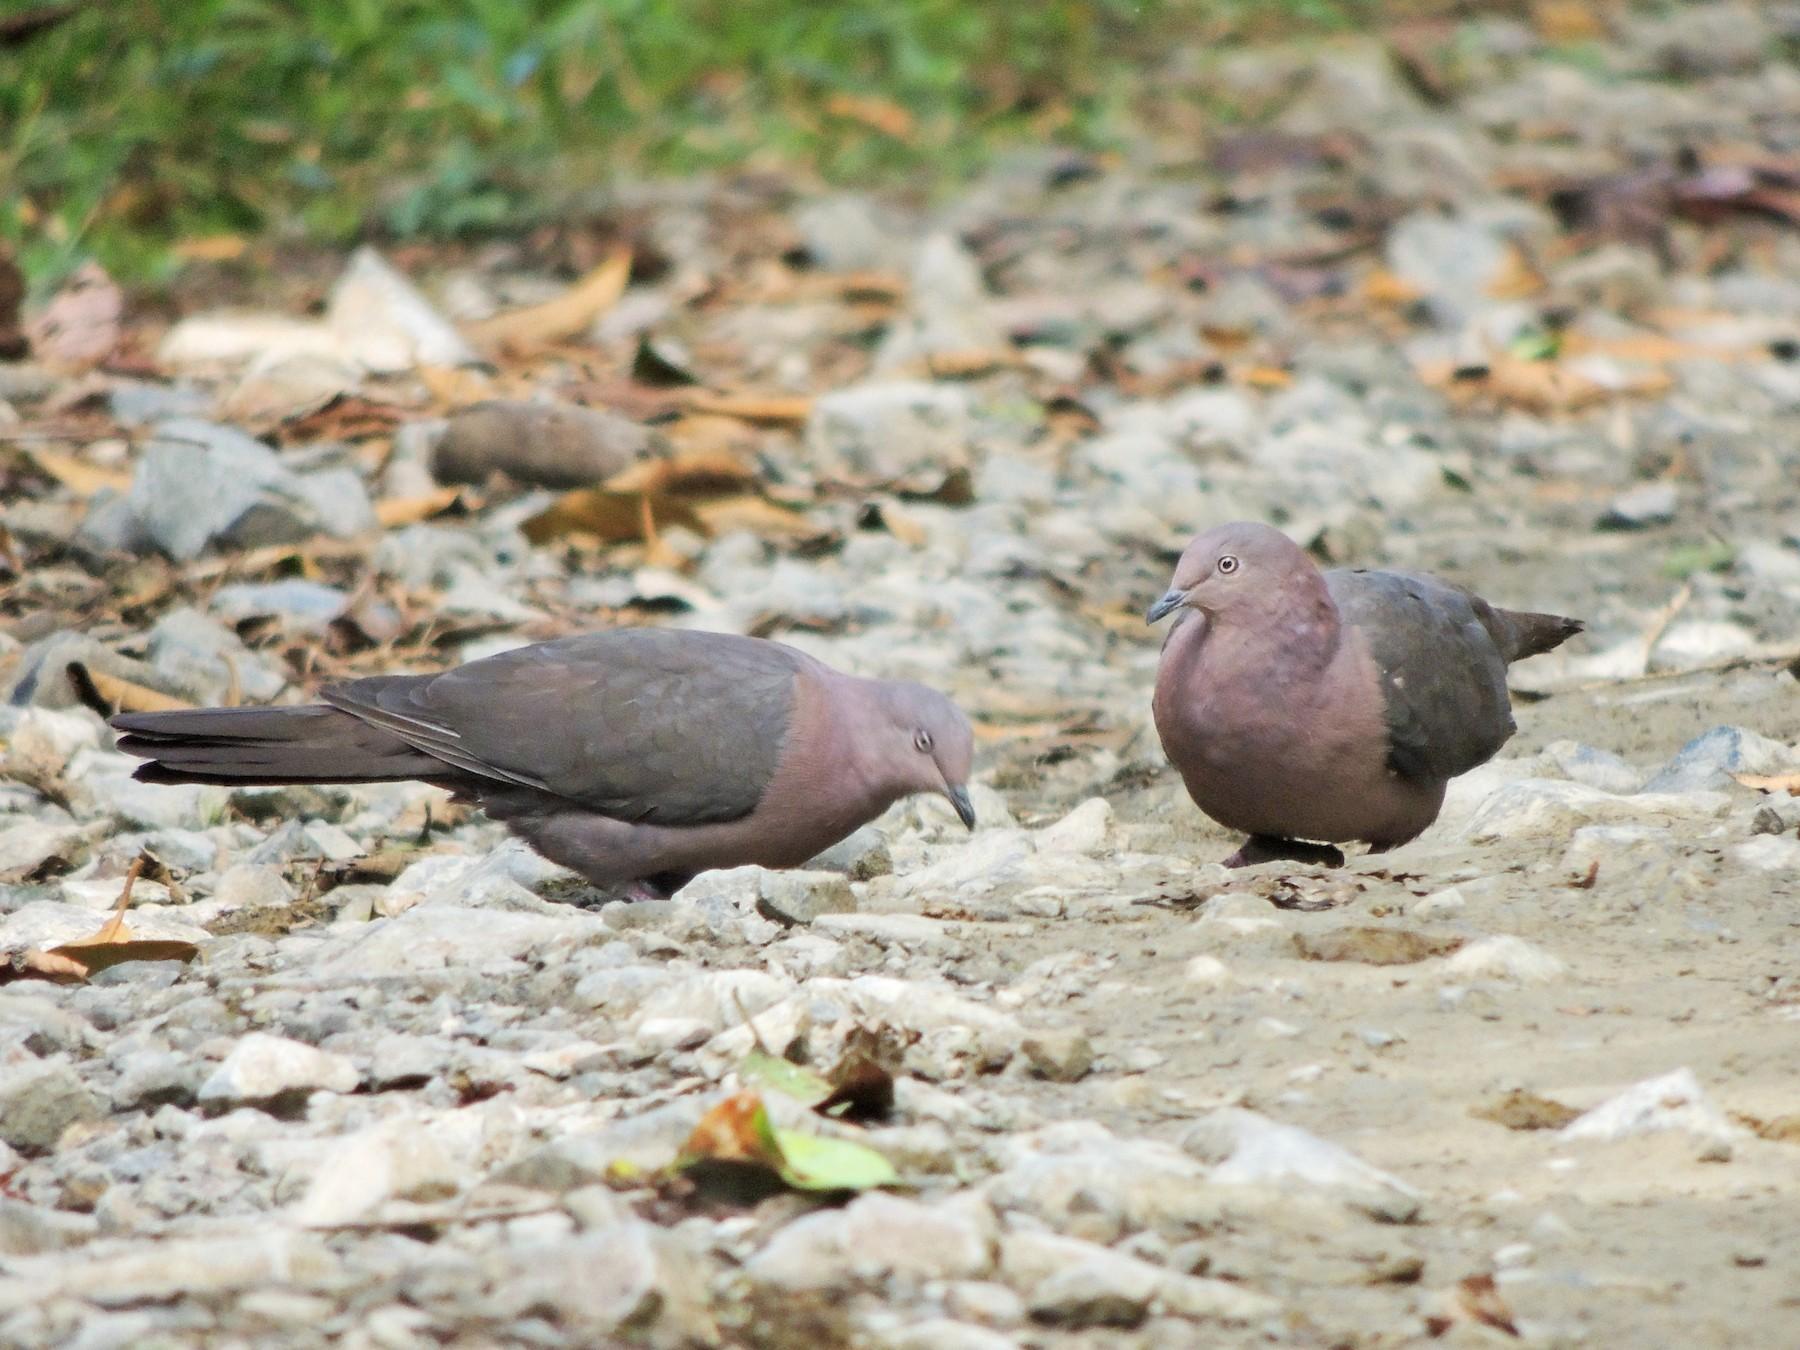 Plumbeous Pigeon - Ottavio Janni